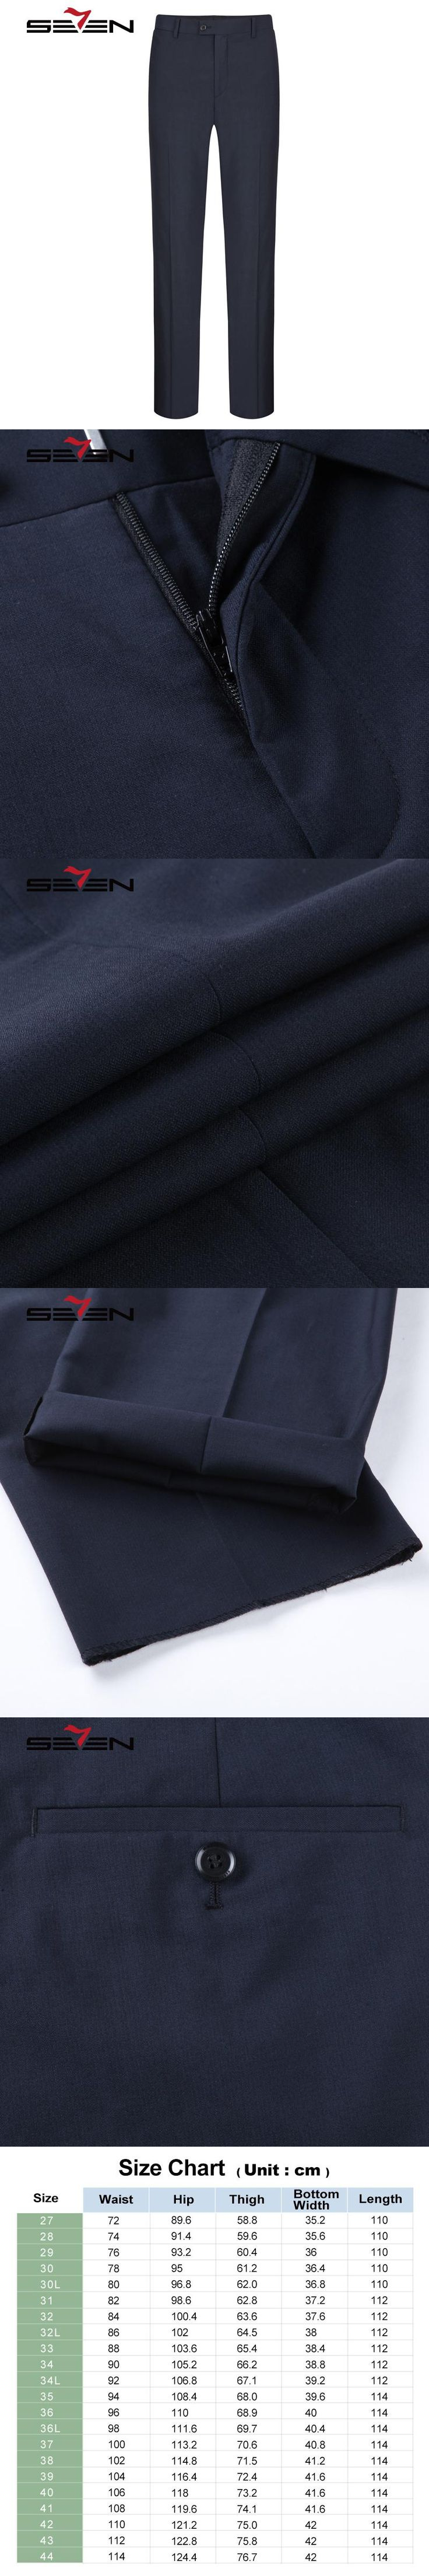 Seven7 Brand Men Suit Pants Wool Wedding pant Blended Solid Long Dress Pants Regular Fit Classic Business Formal Pants 112B70070